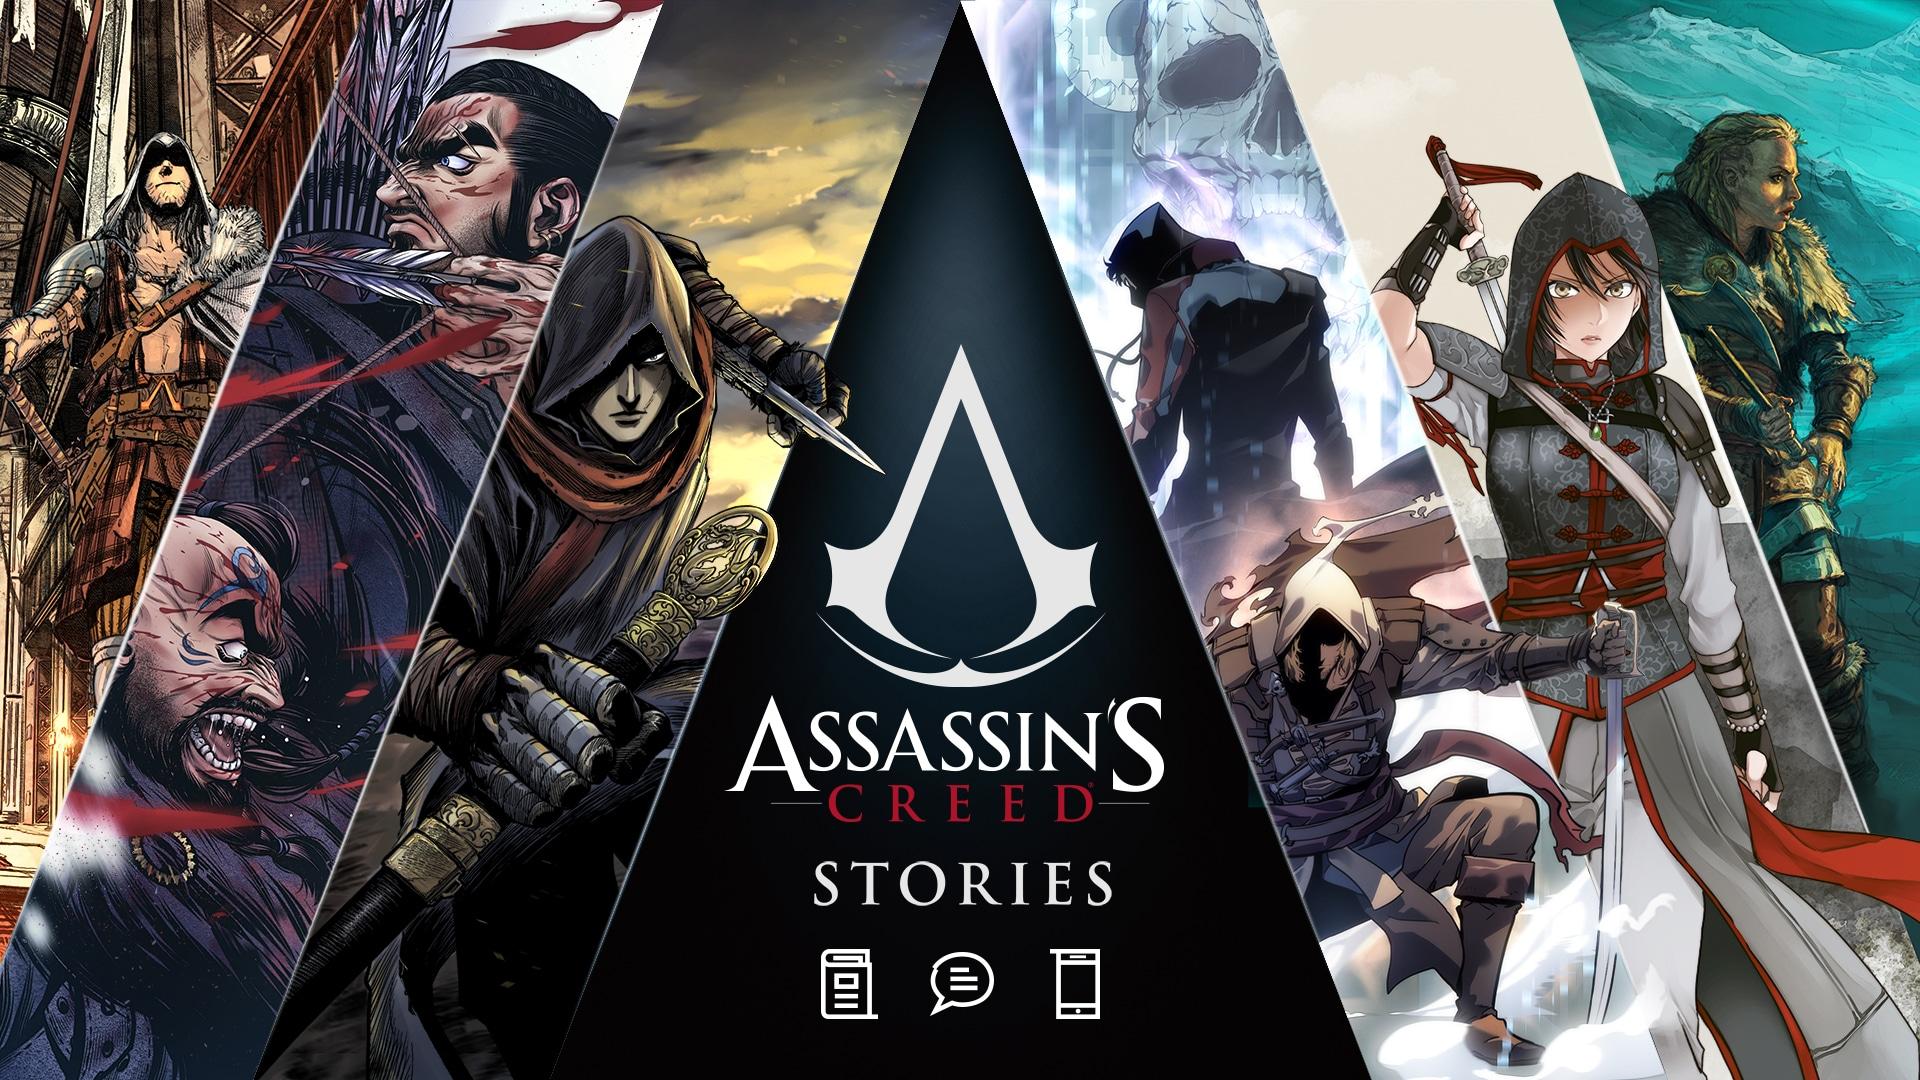 Assassin's Creed Stories: Netflix Show, Anime & Transmedia News!